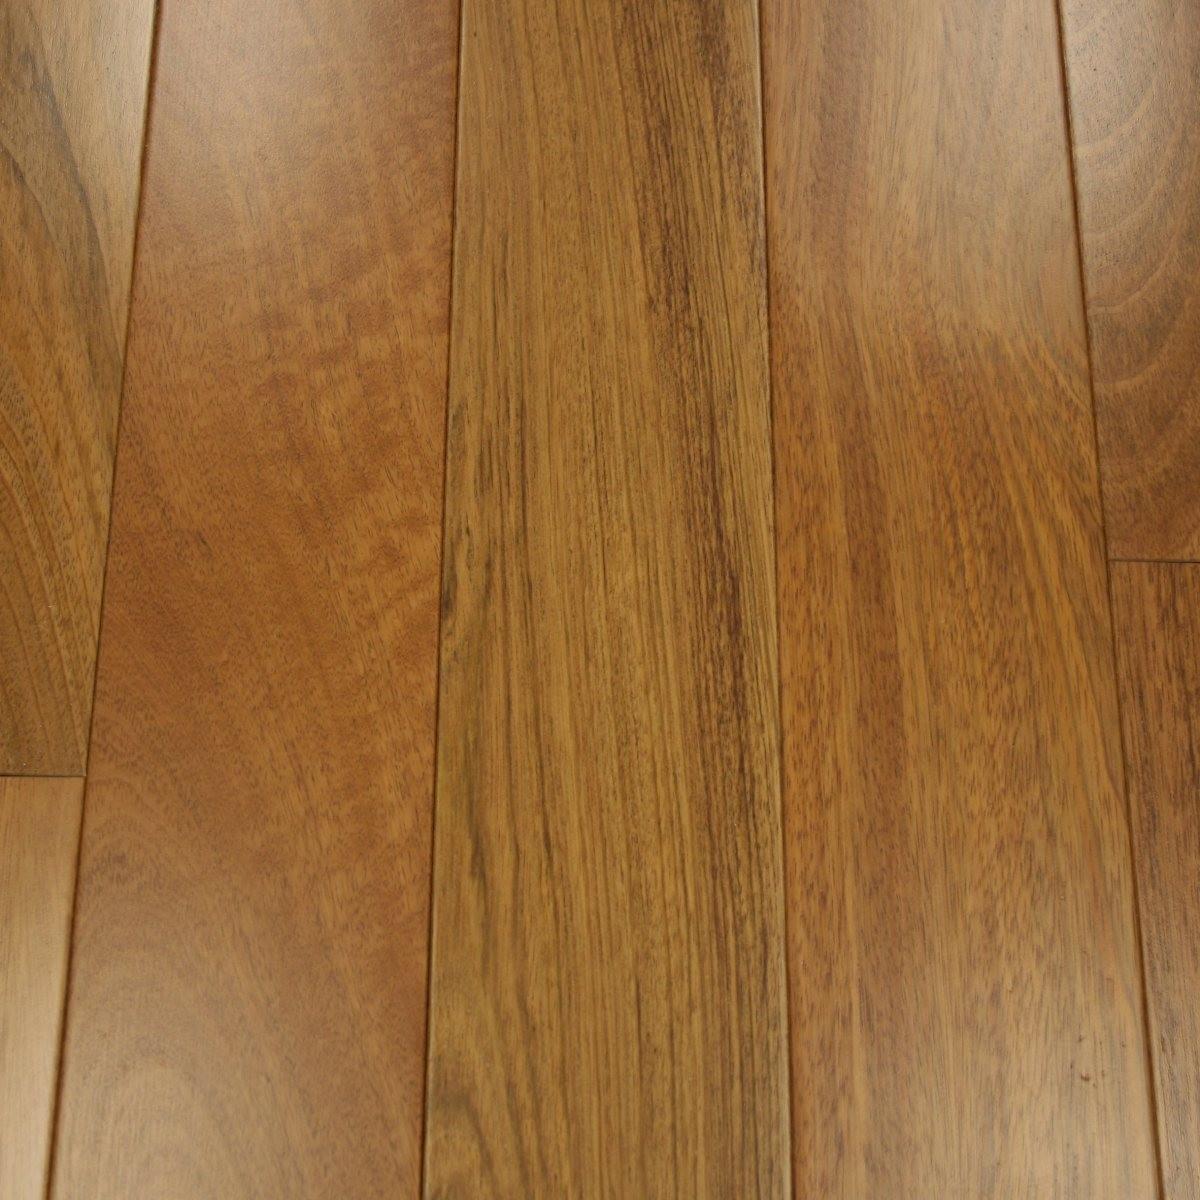 bruce turlington engineered hardwood flooring of all flooring store com maple hardwood flooring mannington madison in baker s creek exotic brazilian cherry natural 1 2 thick